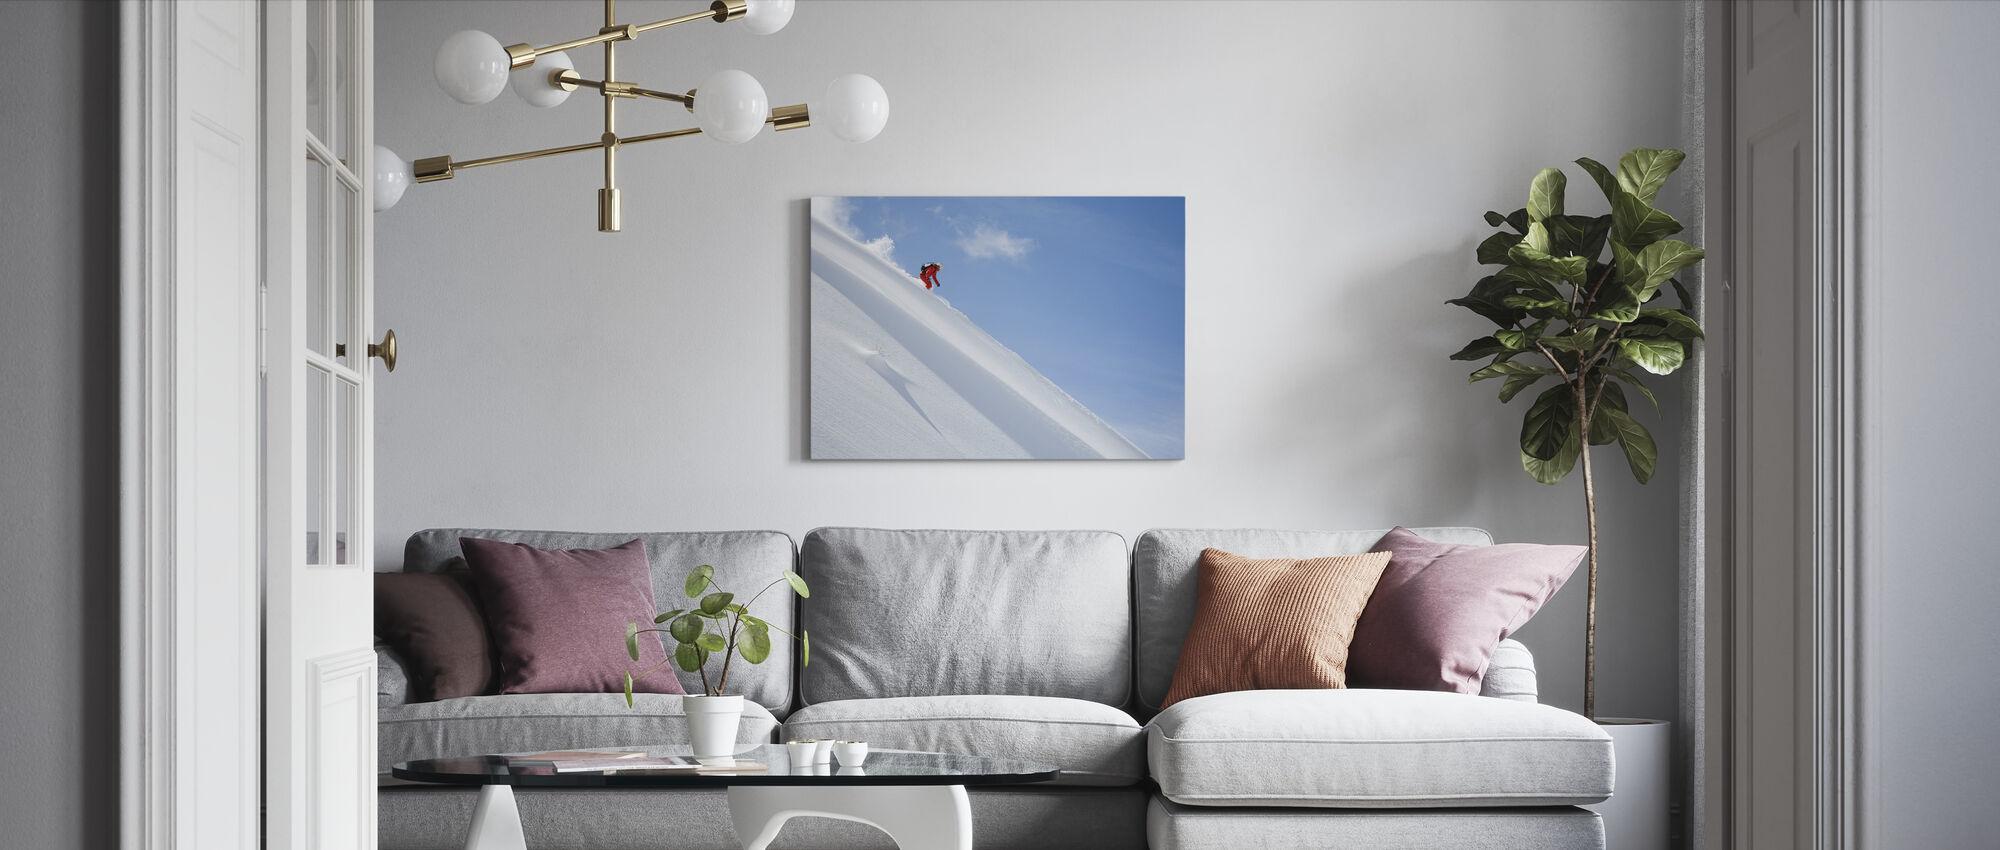 Skiën buiten de piste - Canvas print - Woonkamer